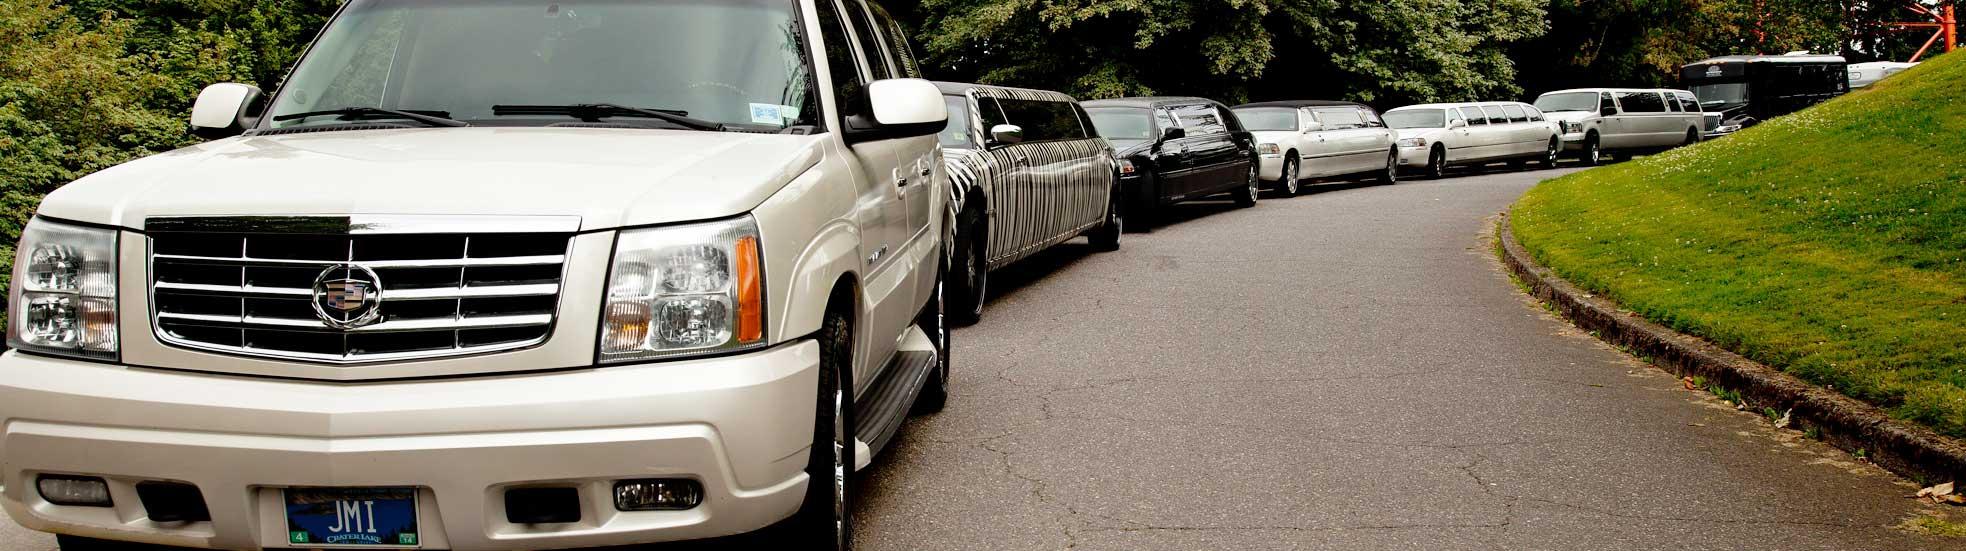 JMi Limousine Fleet